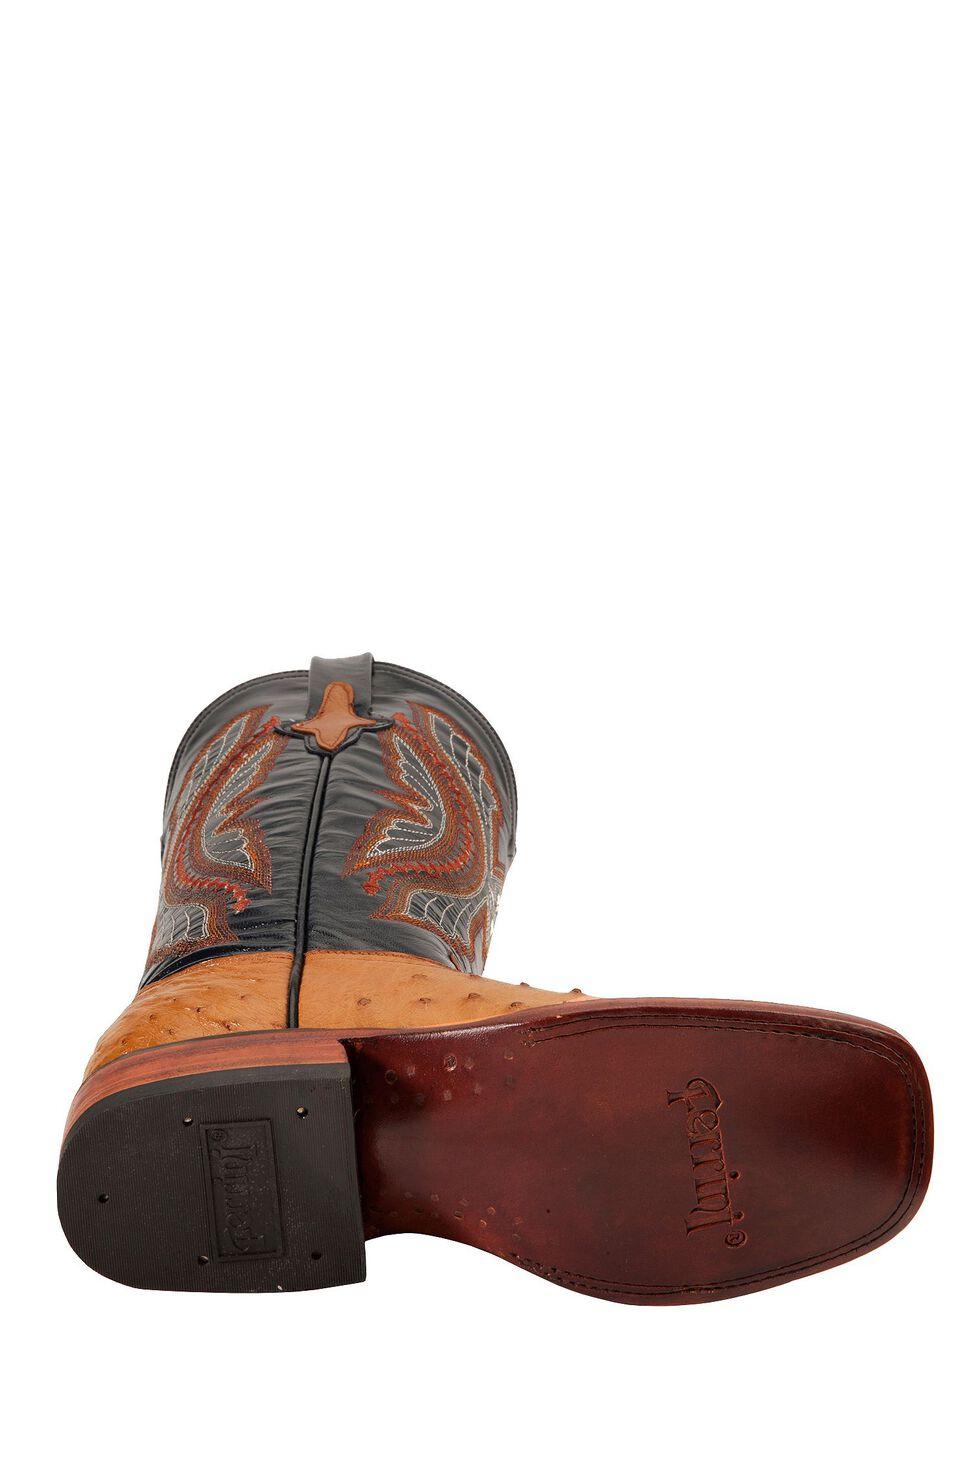 Ferrini Full Quill Ostrich Cognac Cowgirl Boots - Square Toe, Cognac, hi-res